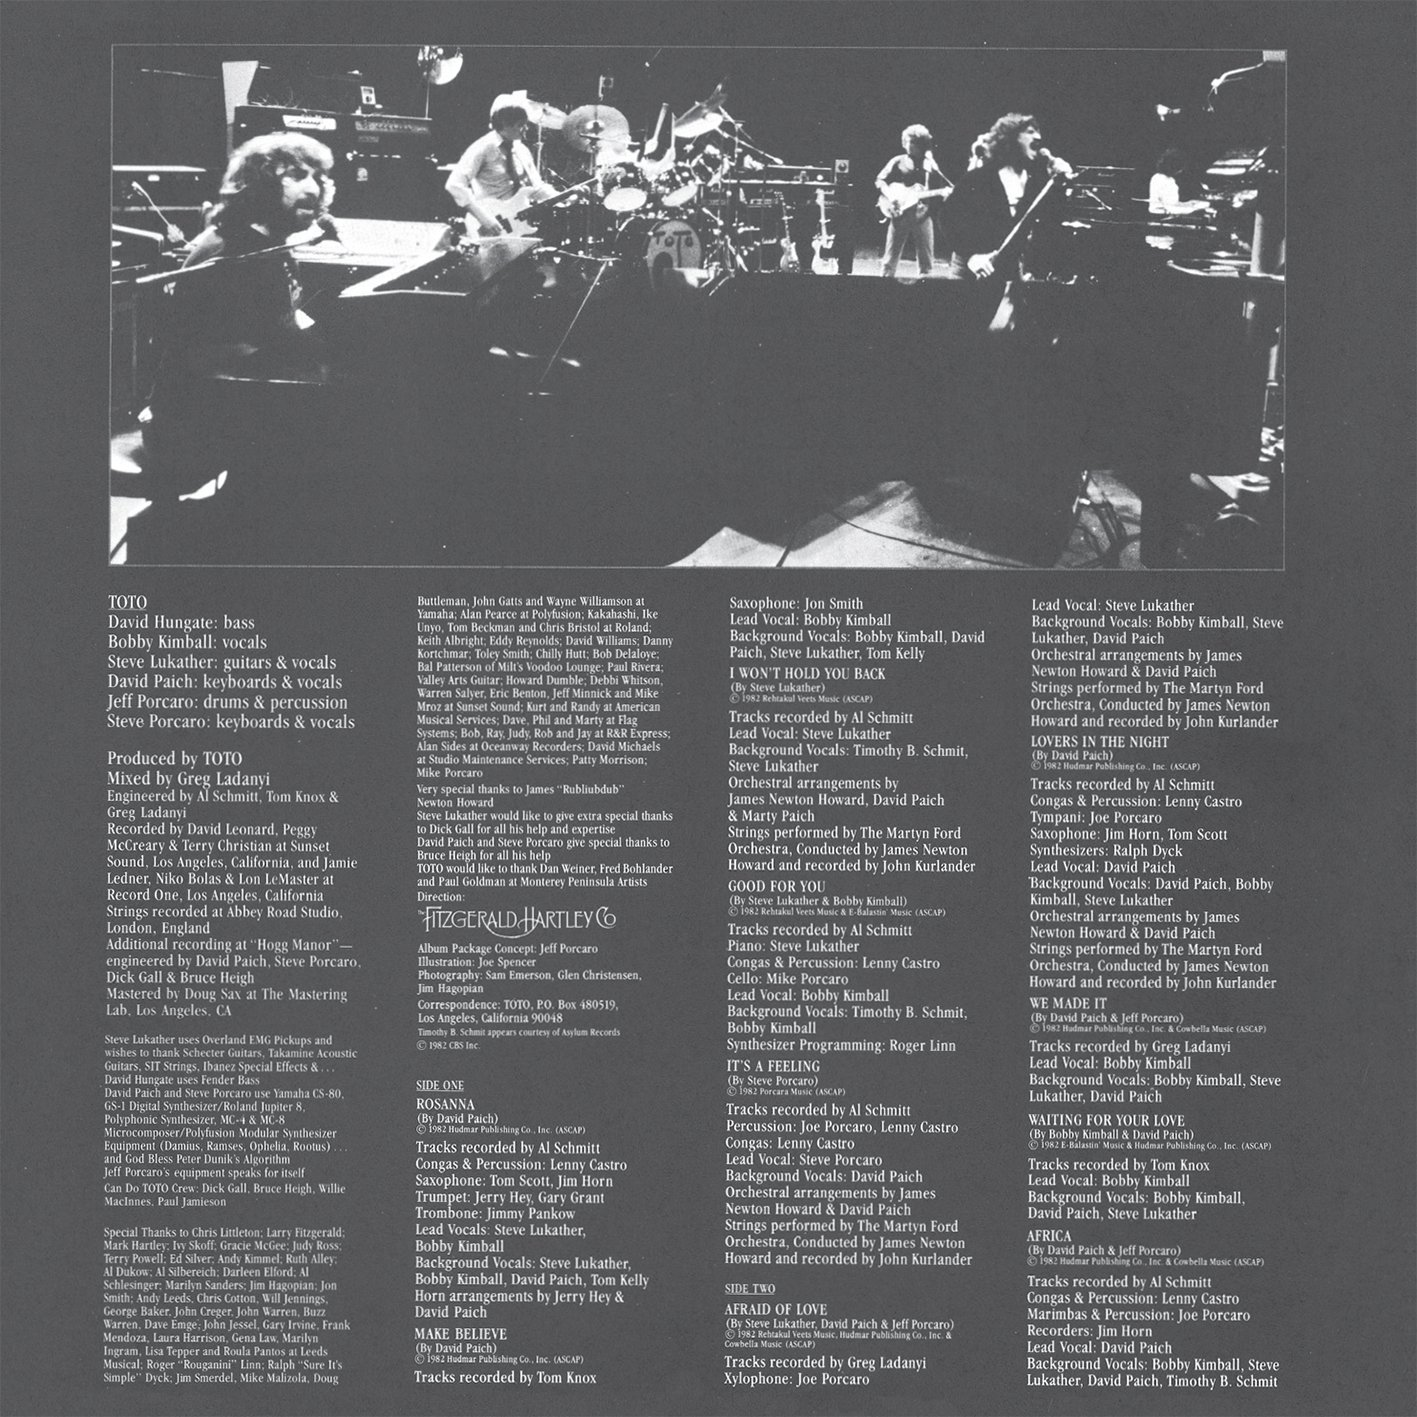 Toto IV (Deluxe vinyl replica) by Toto: Amazon.co.uk: Music